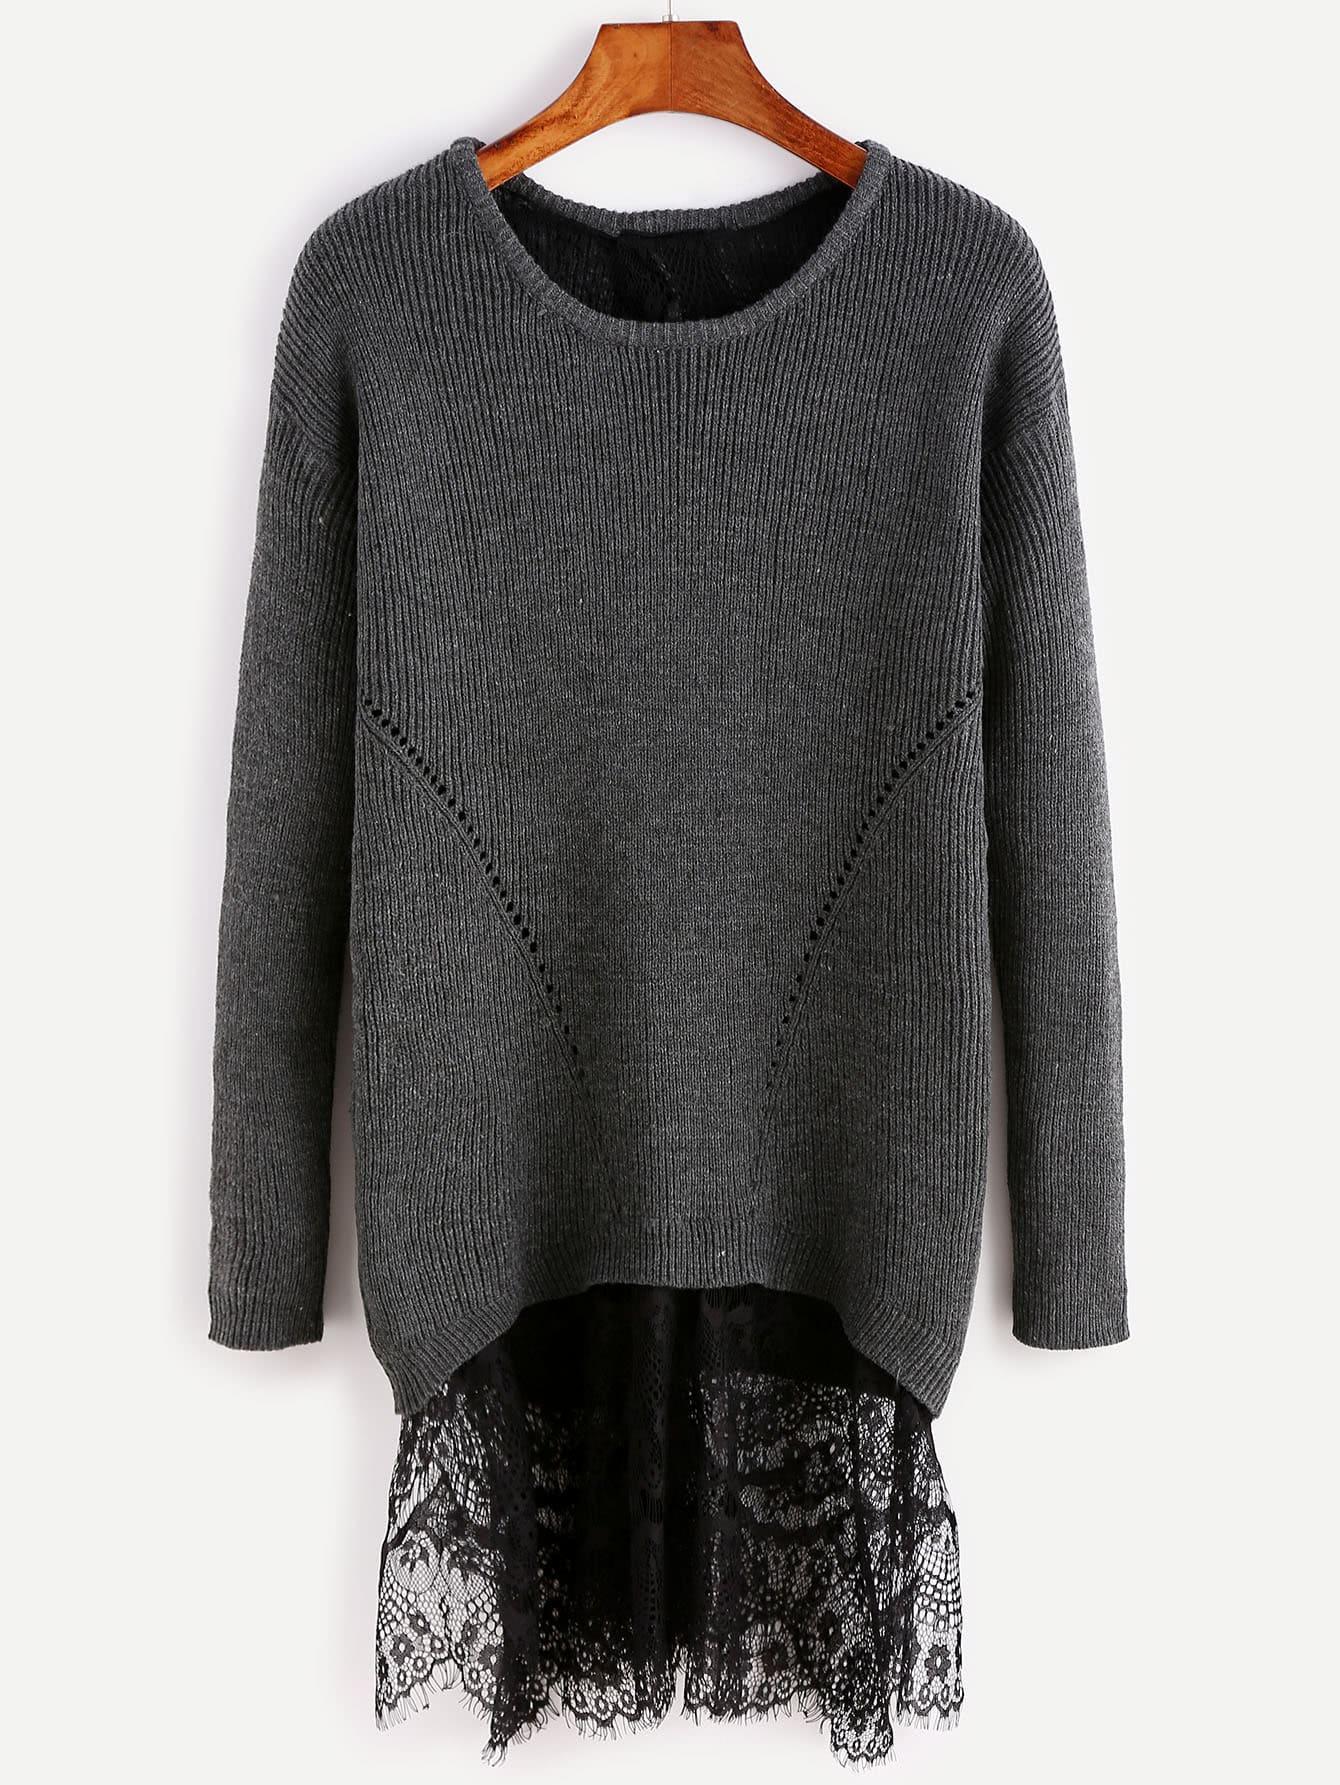 Black Drop Shoulder Split Back Sweater With Lace Detail sweater160815705